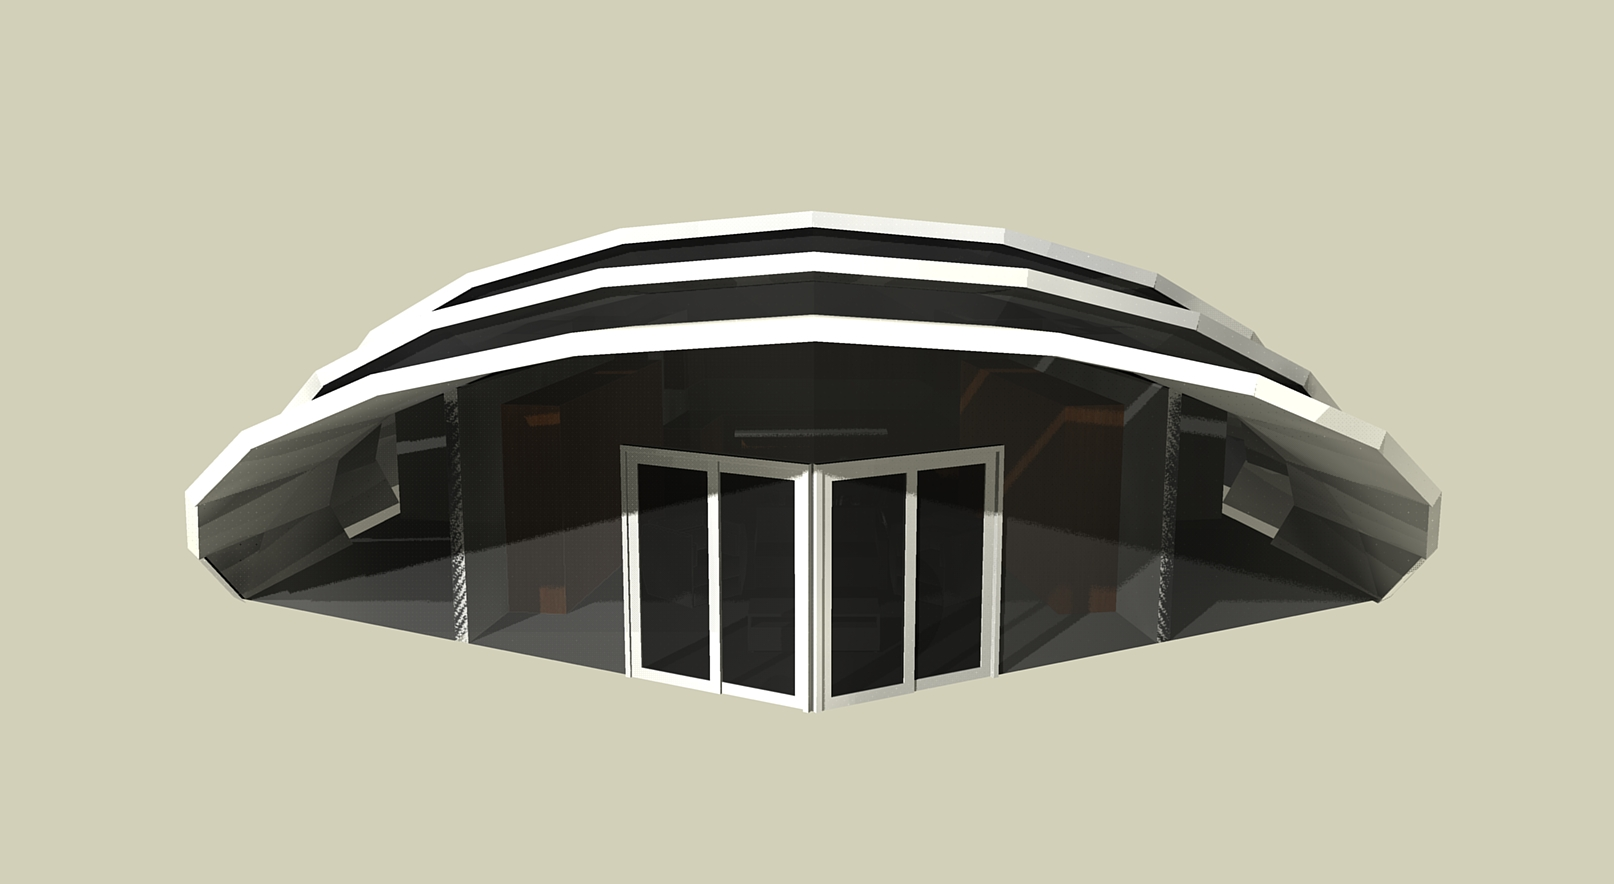 Passive Solar House - Front View